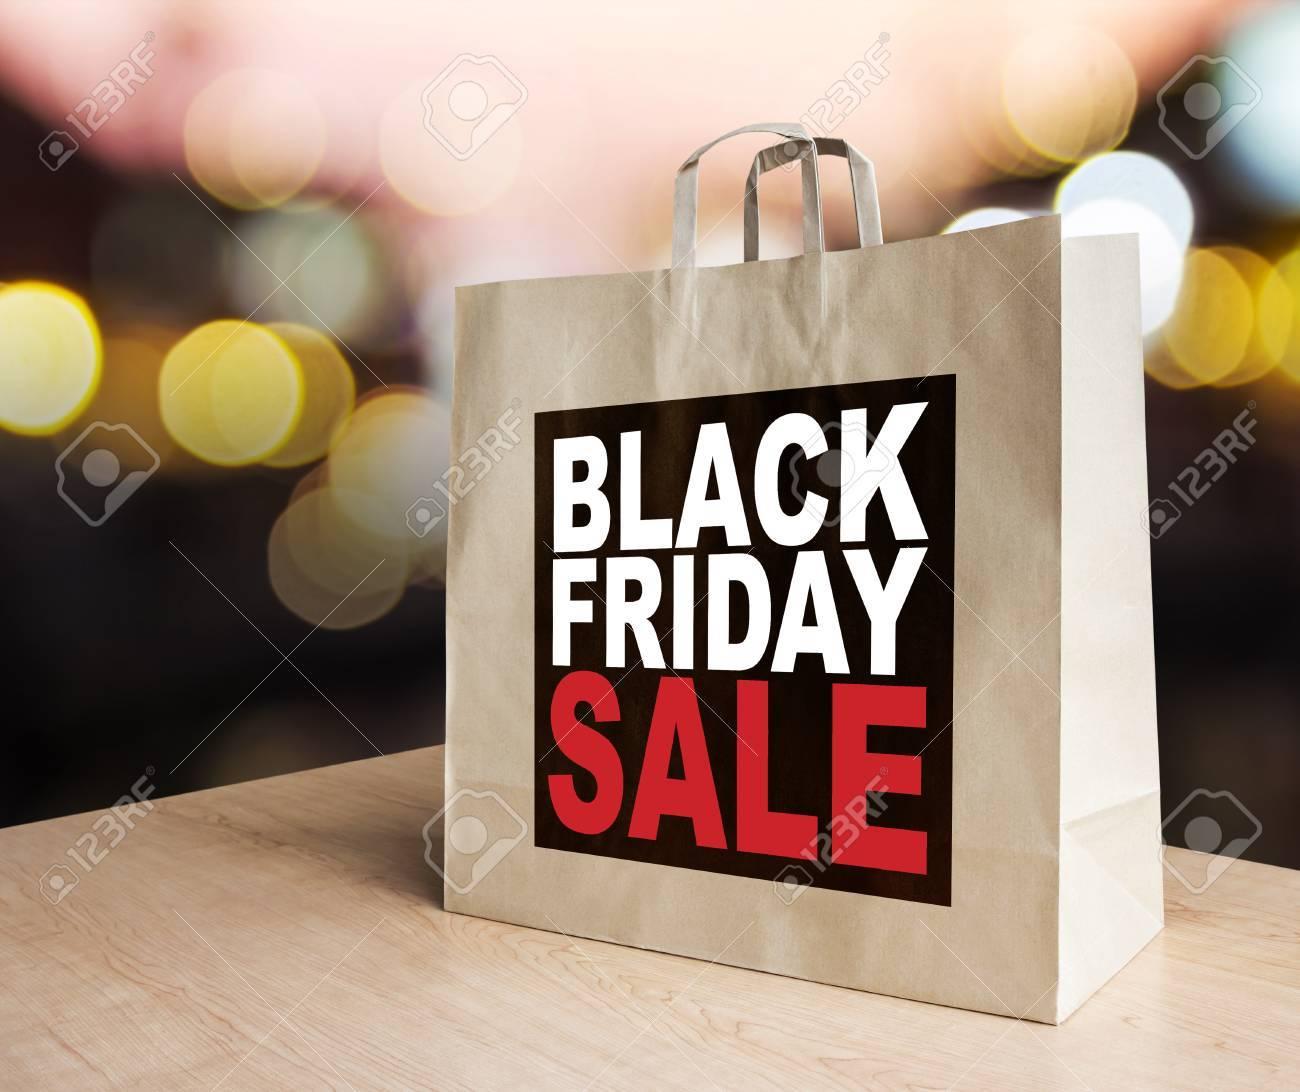 Black friday sale - 61108494